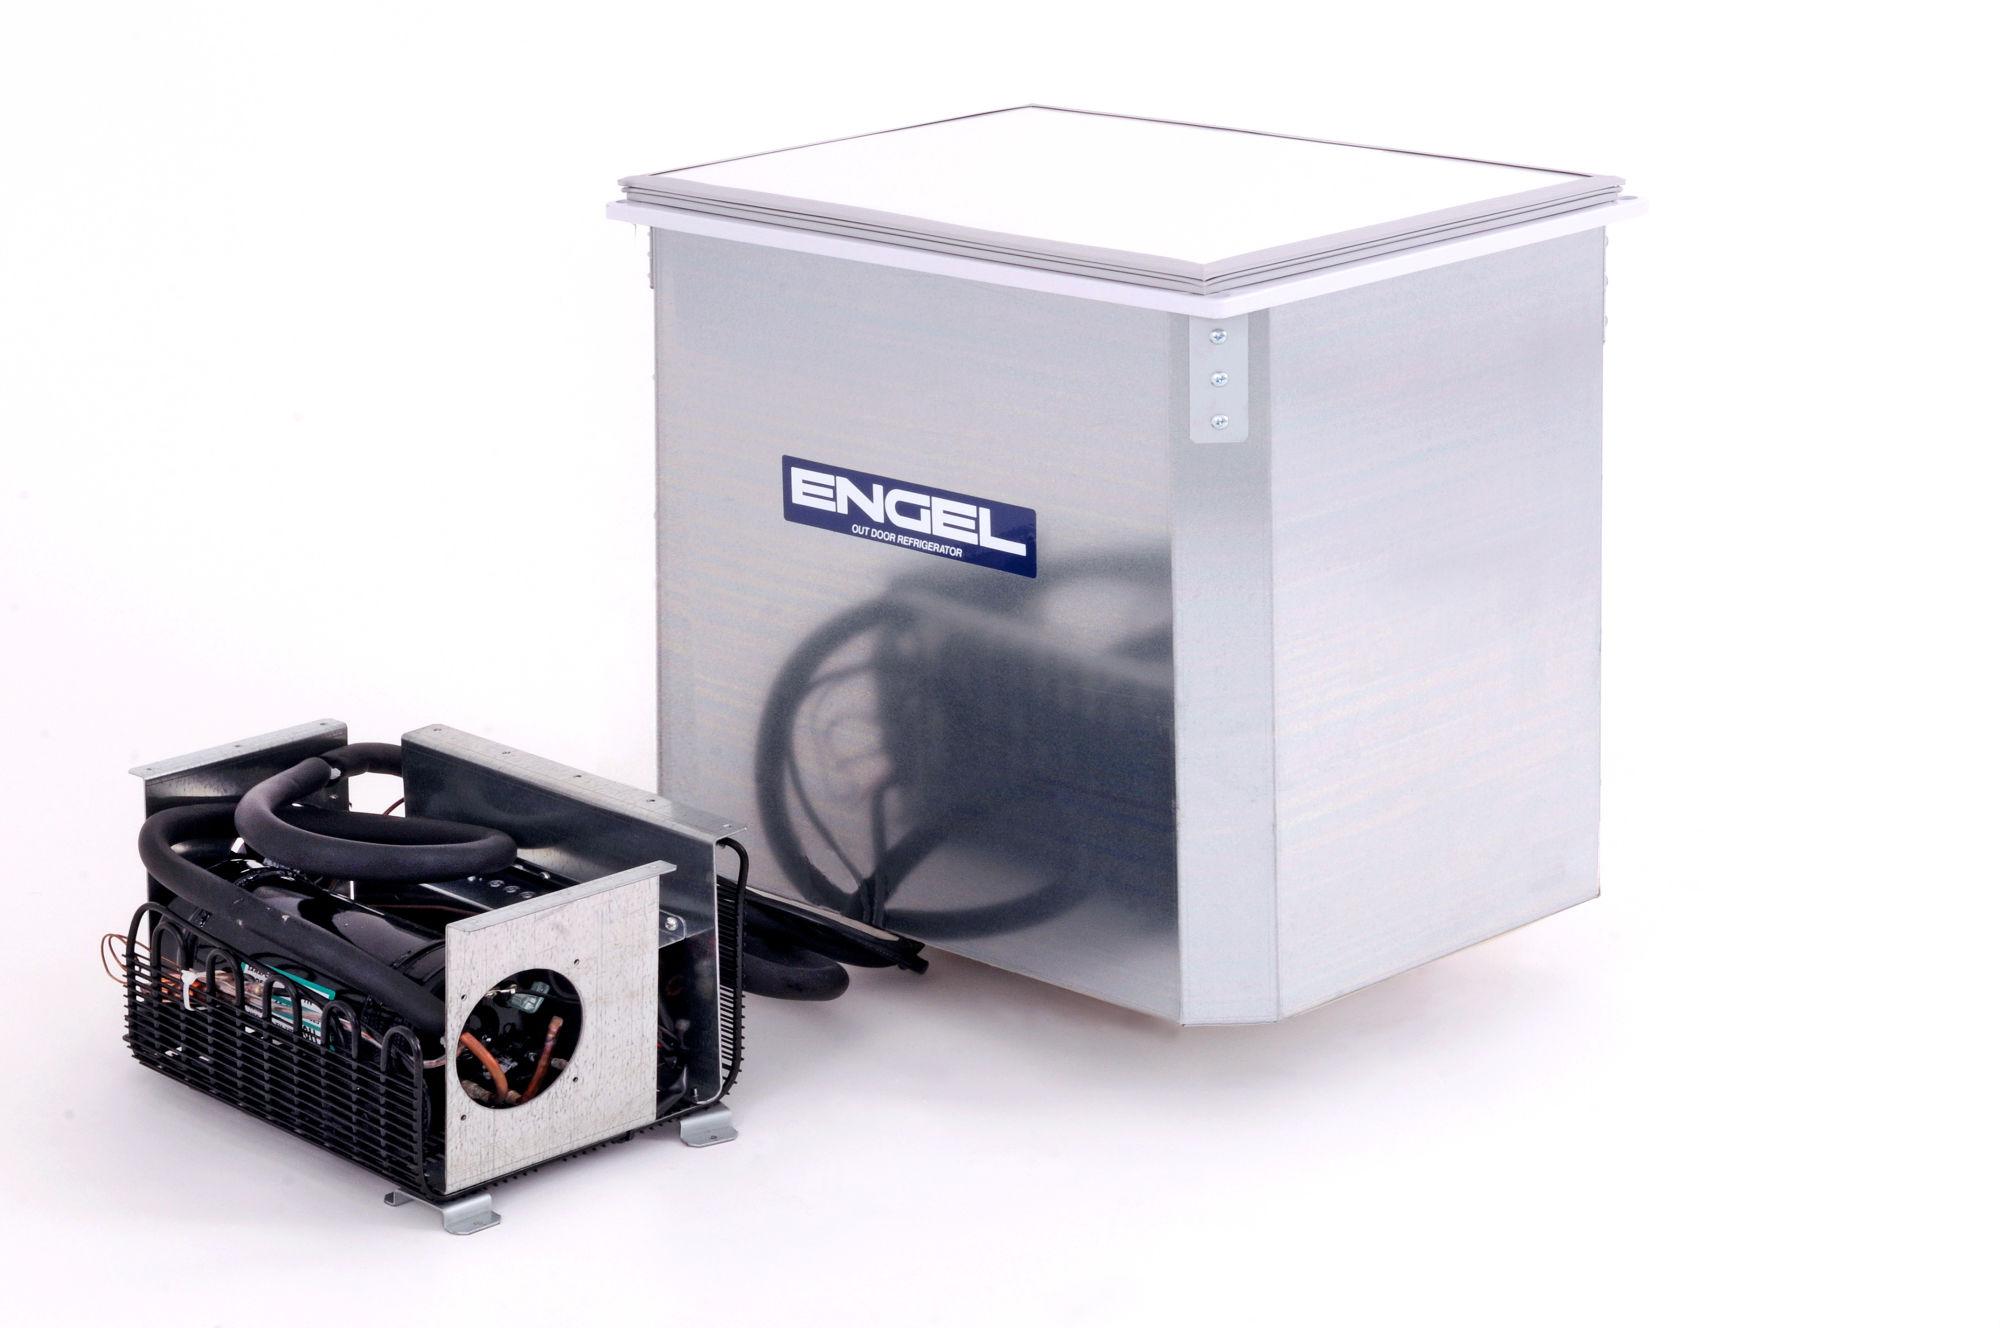 Engel MB 40 V Einbau- Kühlbox Neuheit